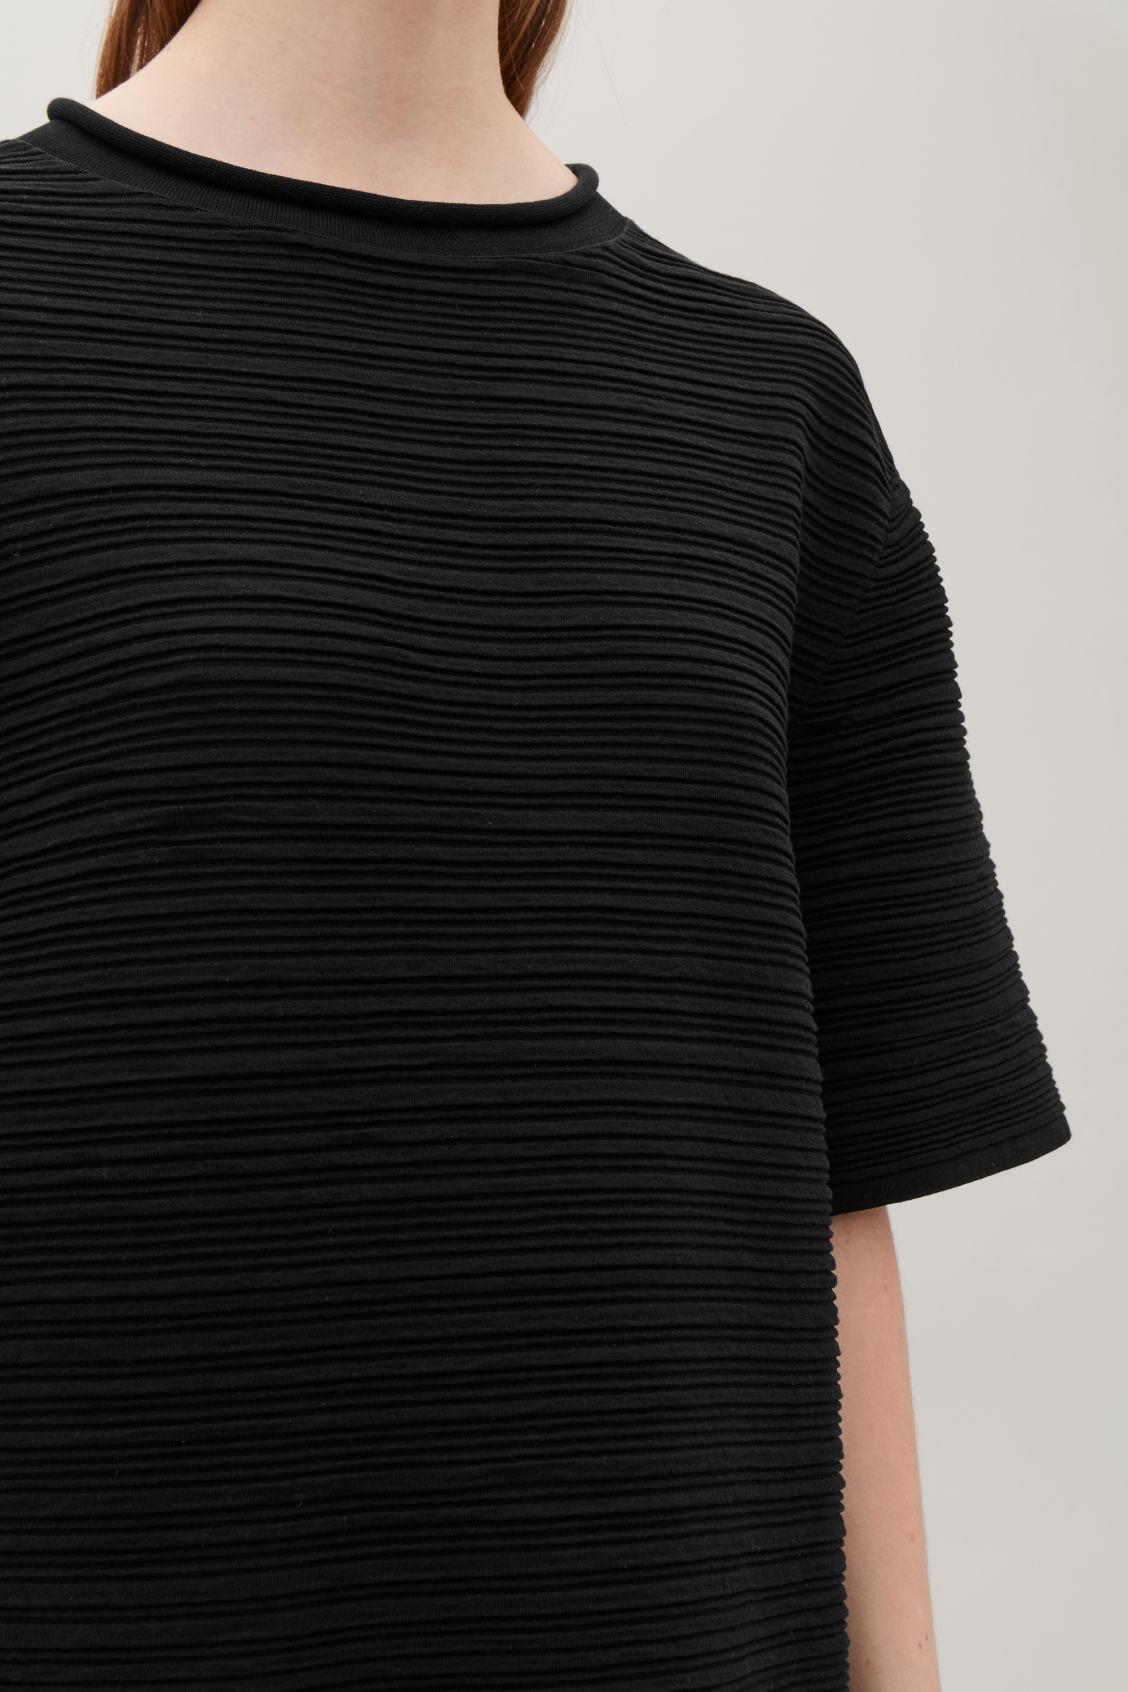 RIPPLED COTTON T-SHIRT DRESS - Black - Dresses - COS